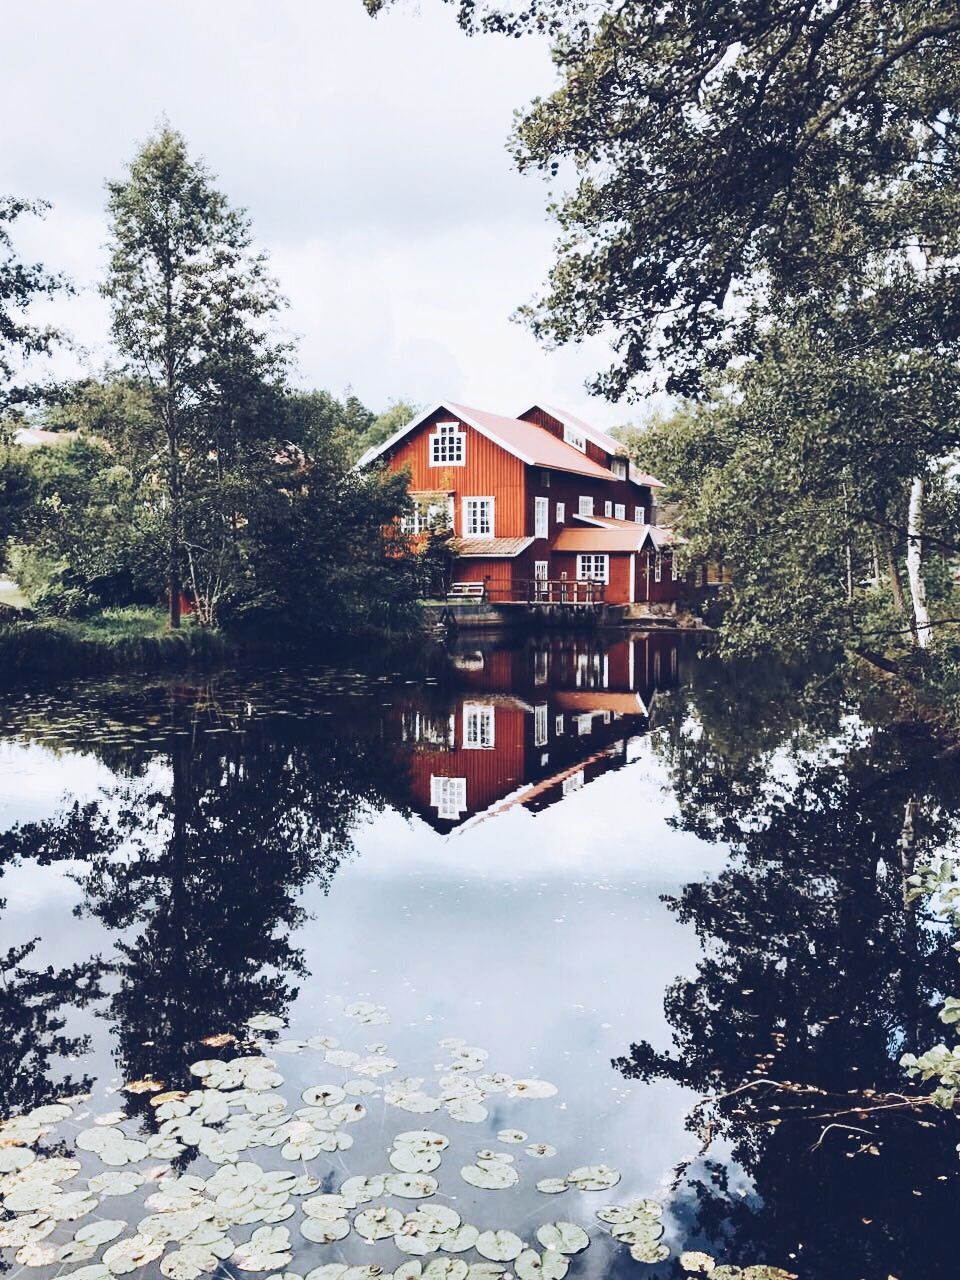 HEJ SMÅLAND - HEY PIPPI LANGSTRUMPF